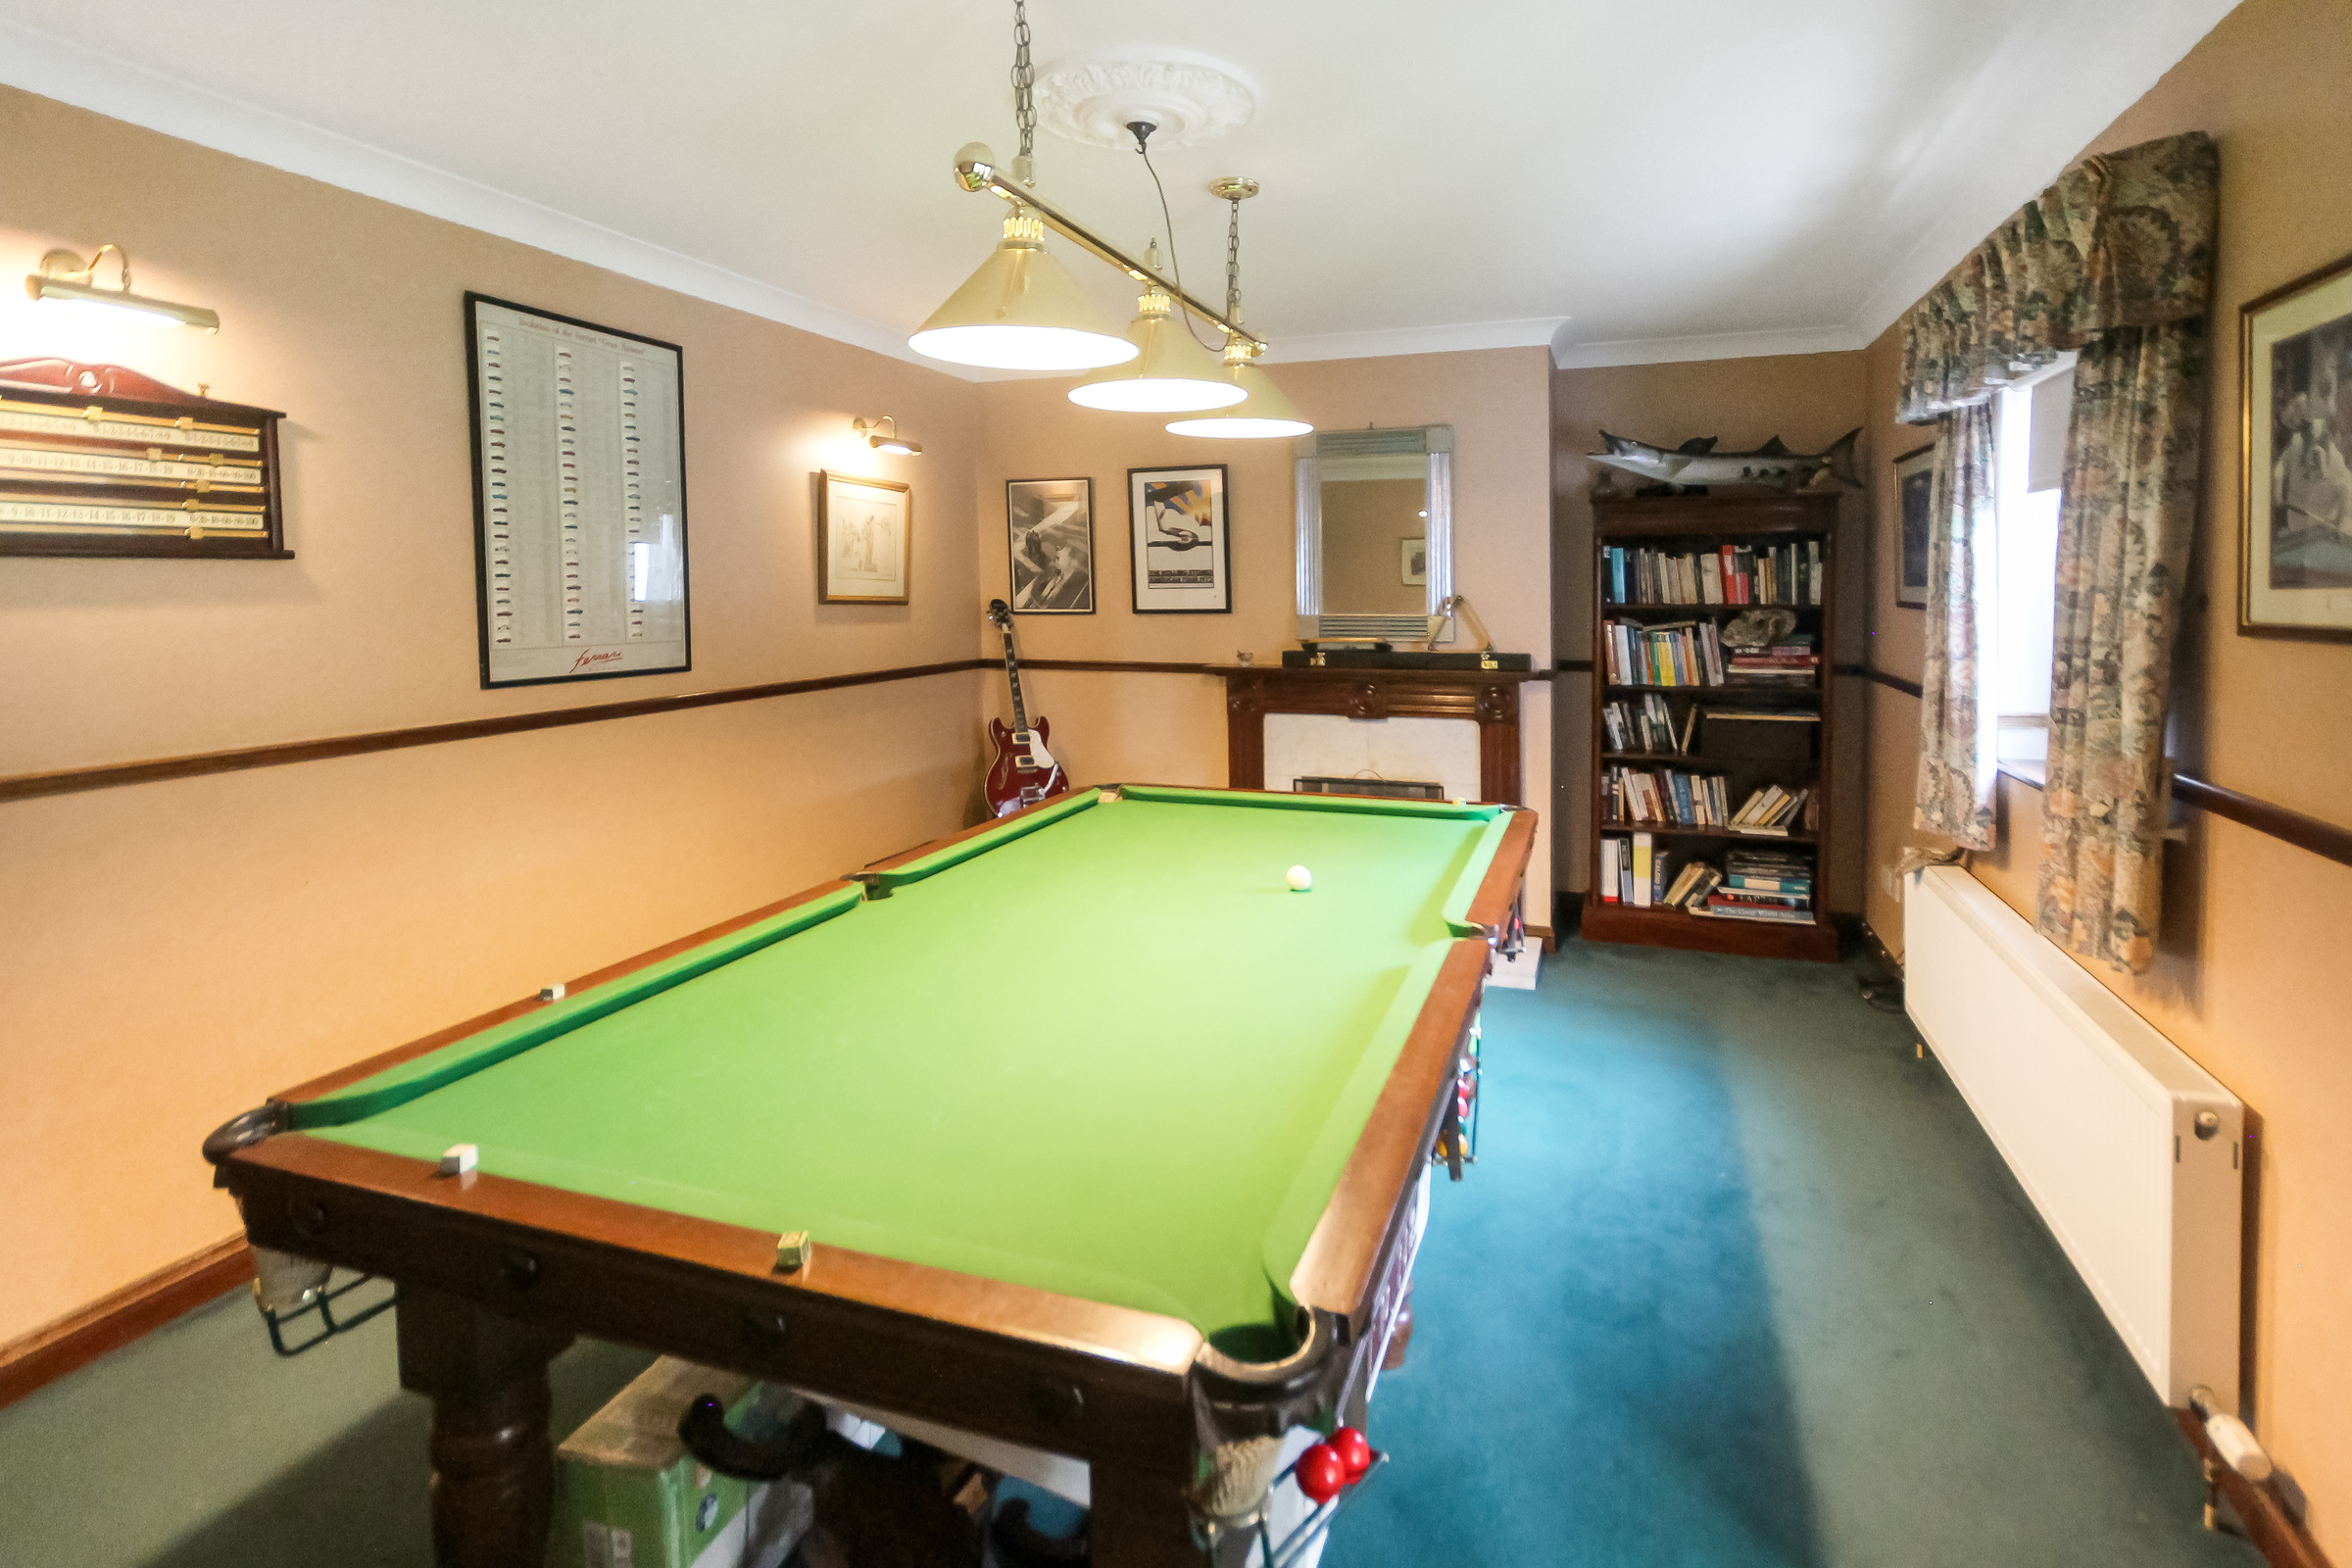 Broadleas, Ballymore Eustace, Co. Kildare